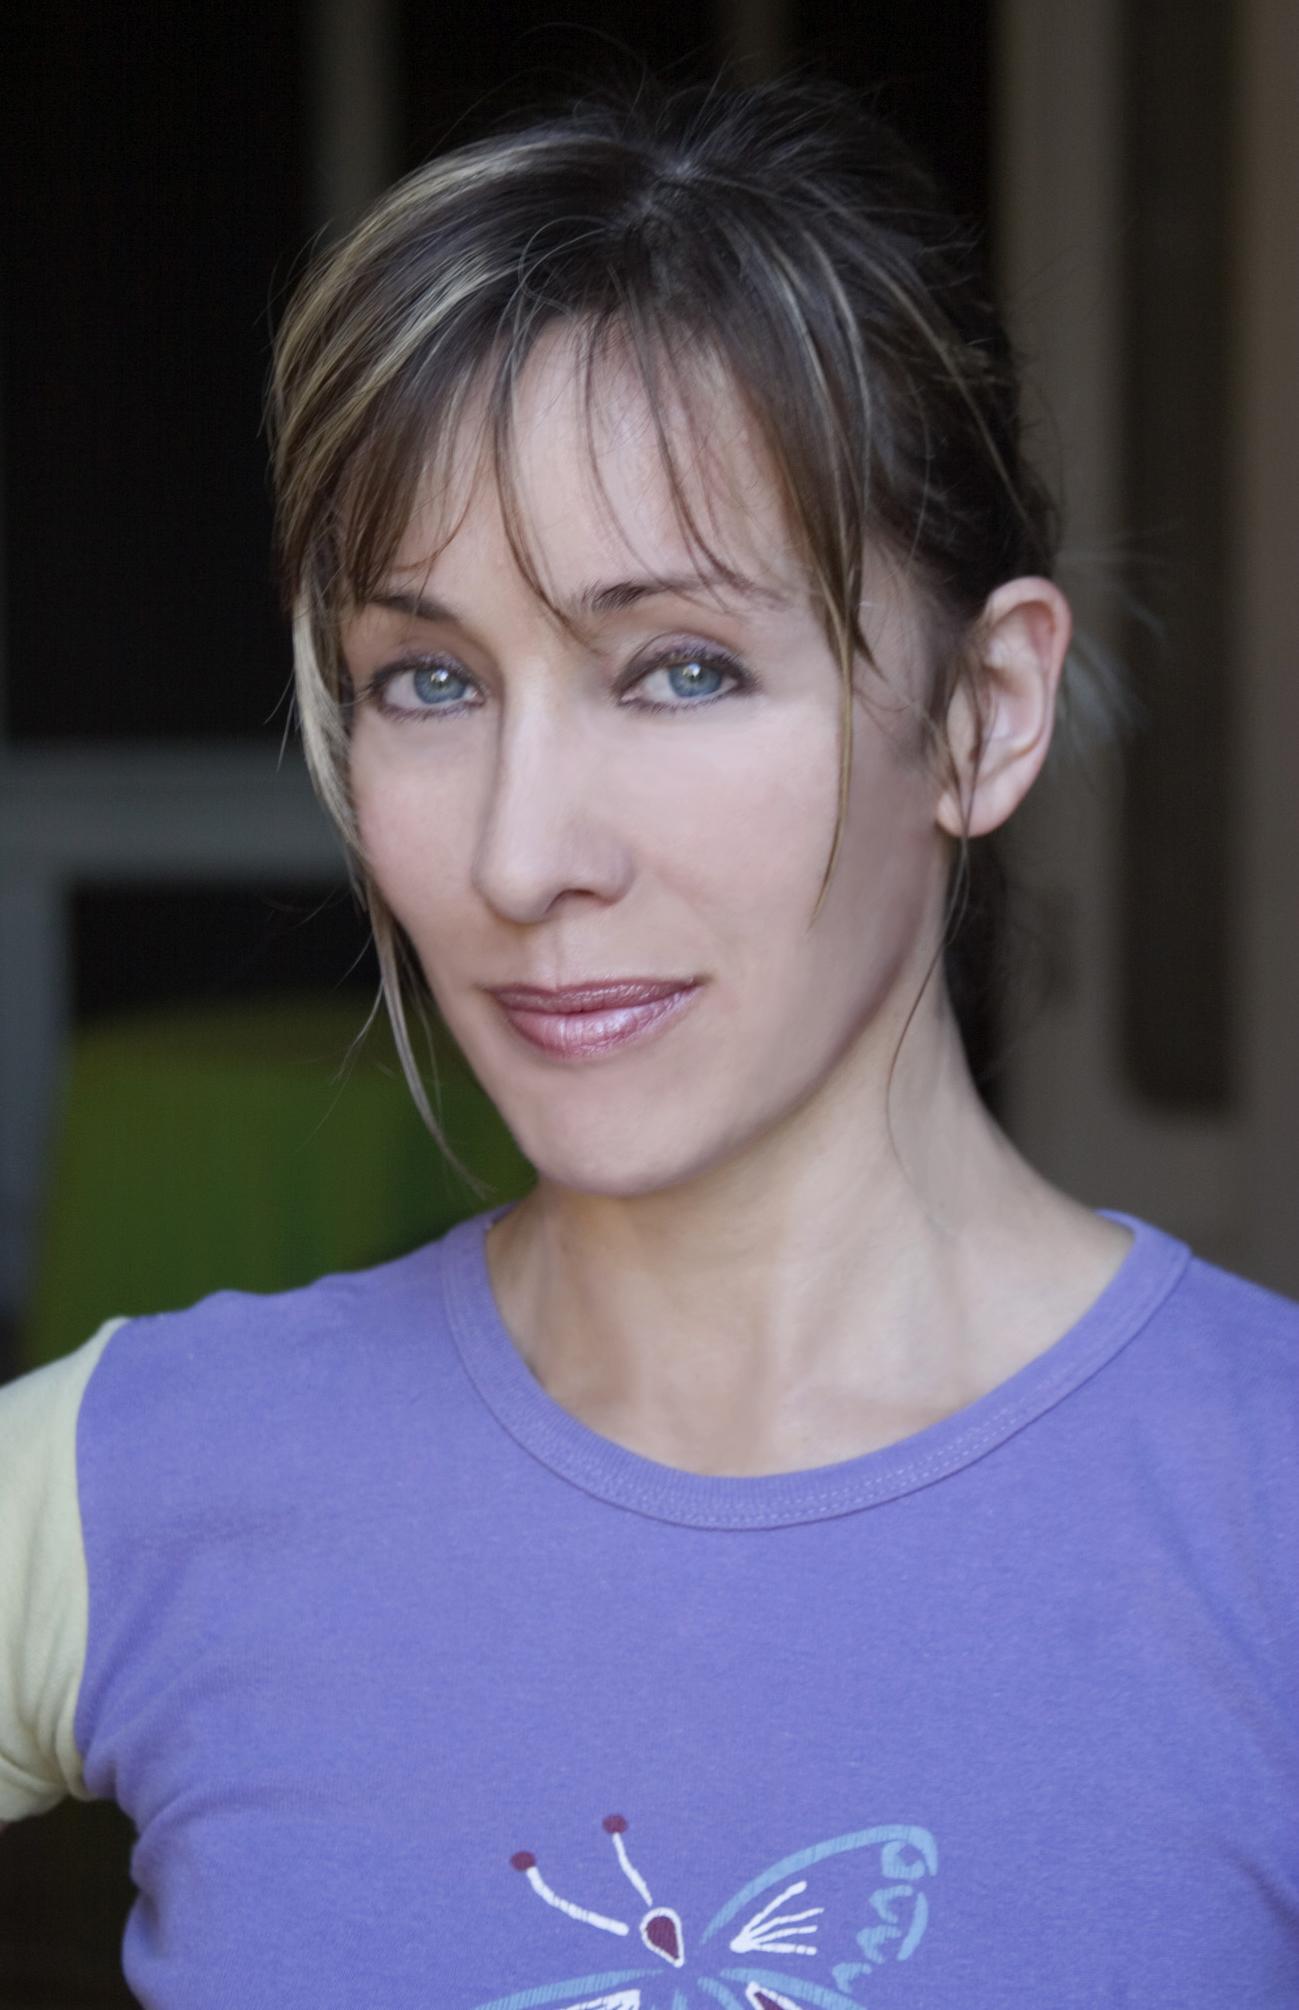 Luz Mariela Ruggeri